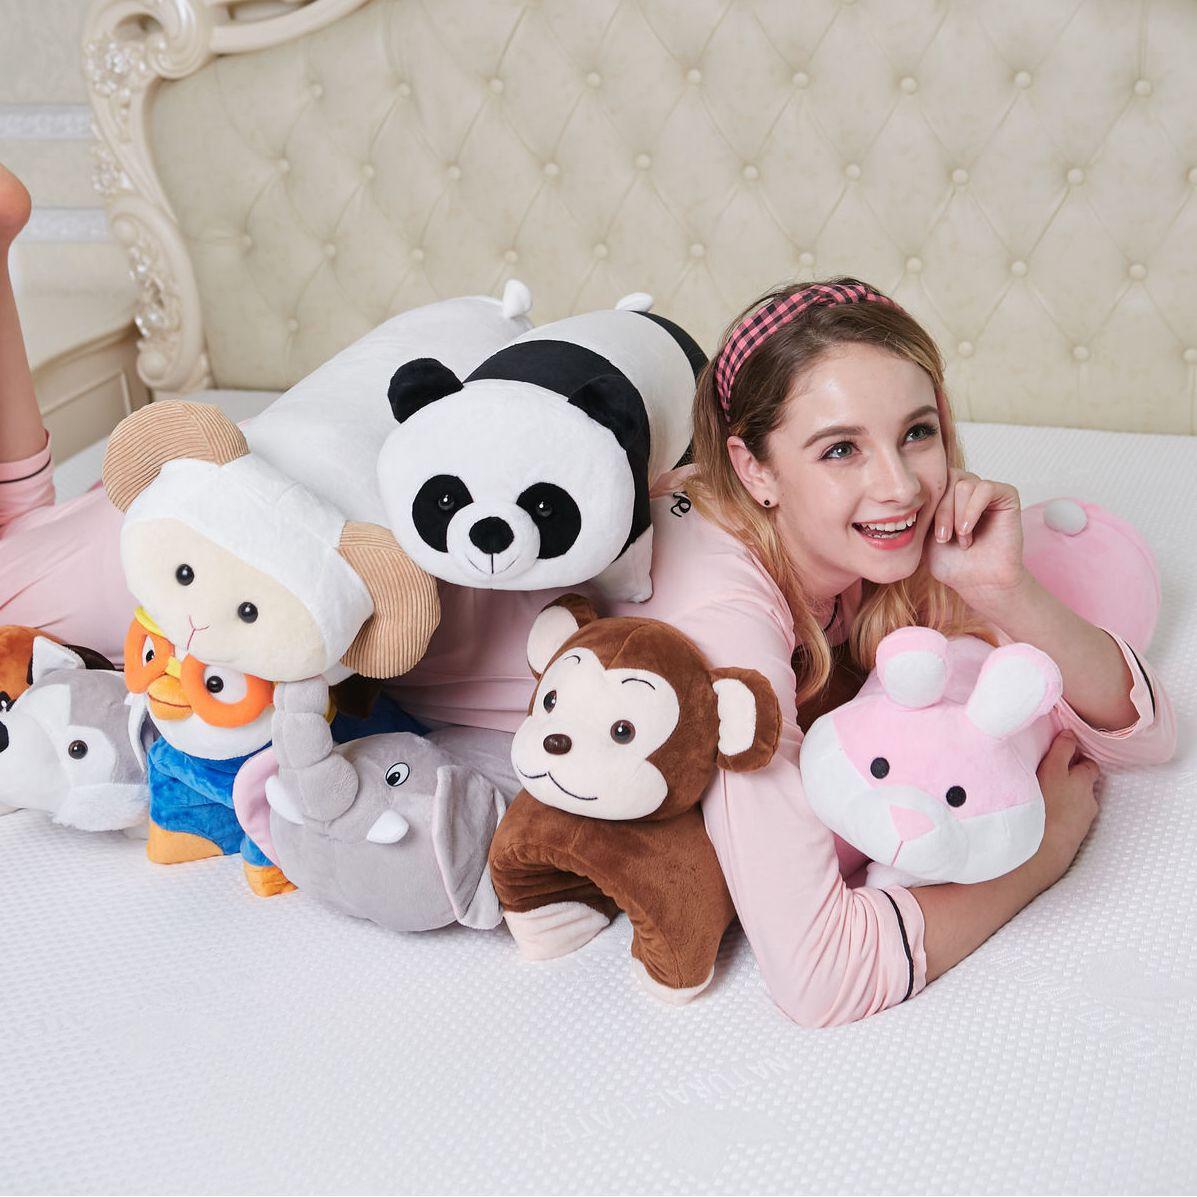 Latex Pillow Cervical Supporting Children's Cartoon Orthopedic Latex Neck Pillow Fiber Inflatable Bamboo Pillow Almohada Viaje